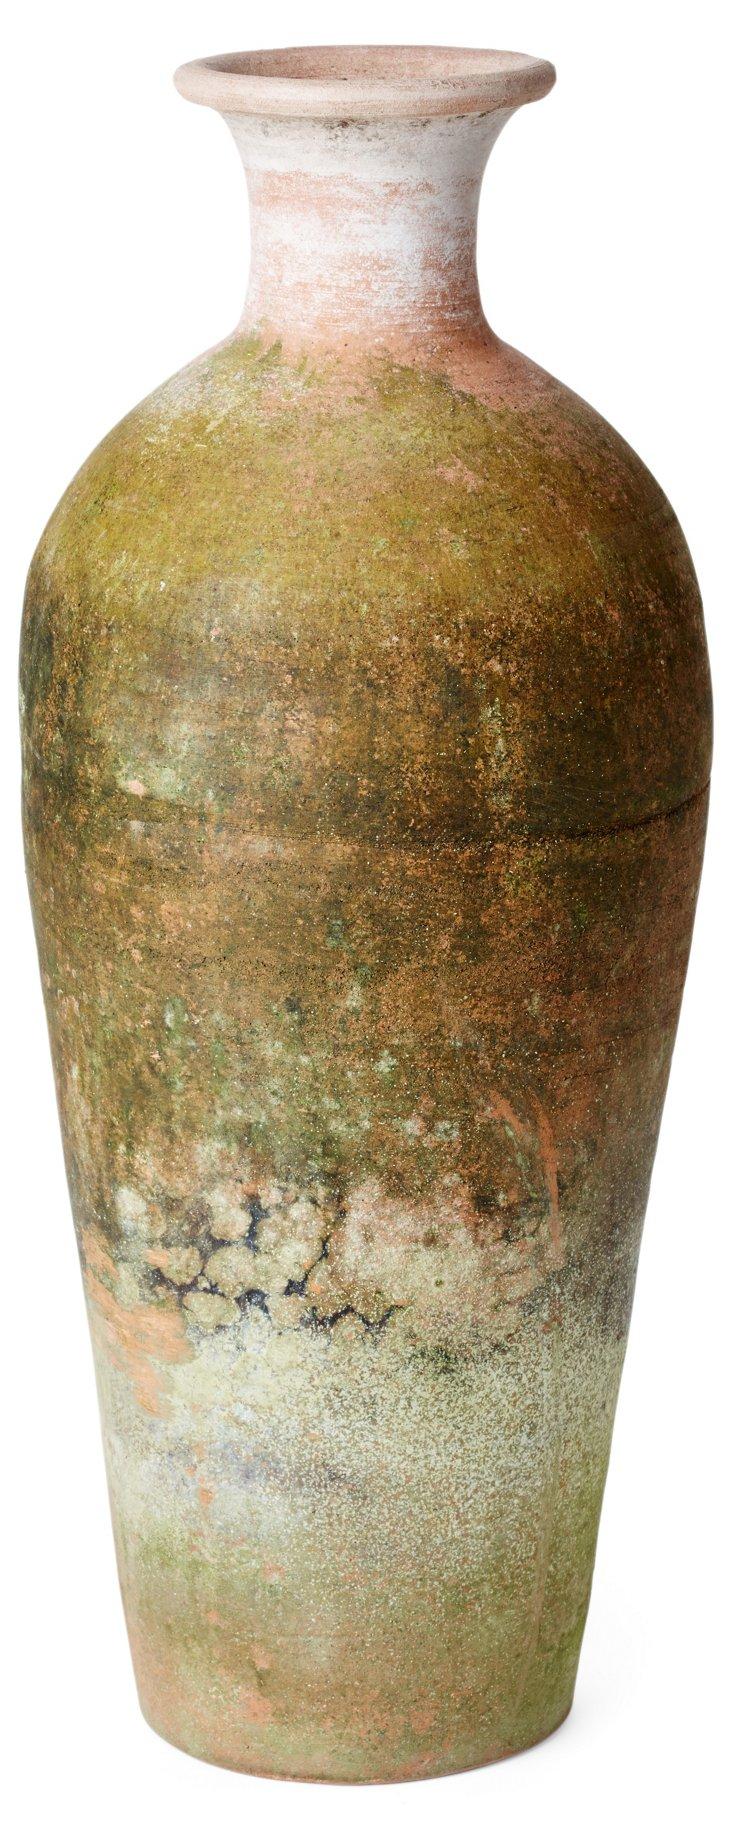 "22"" Aged Terracotta Positano Urn"